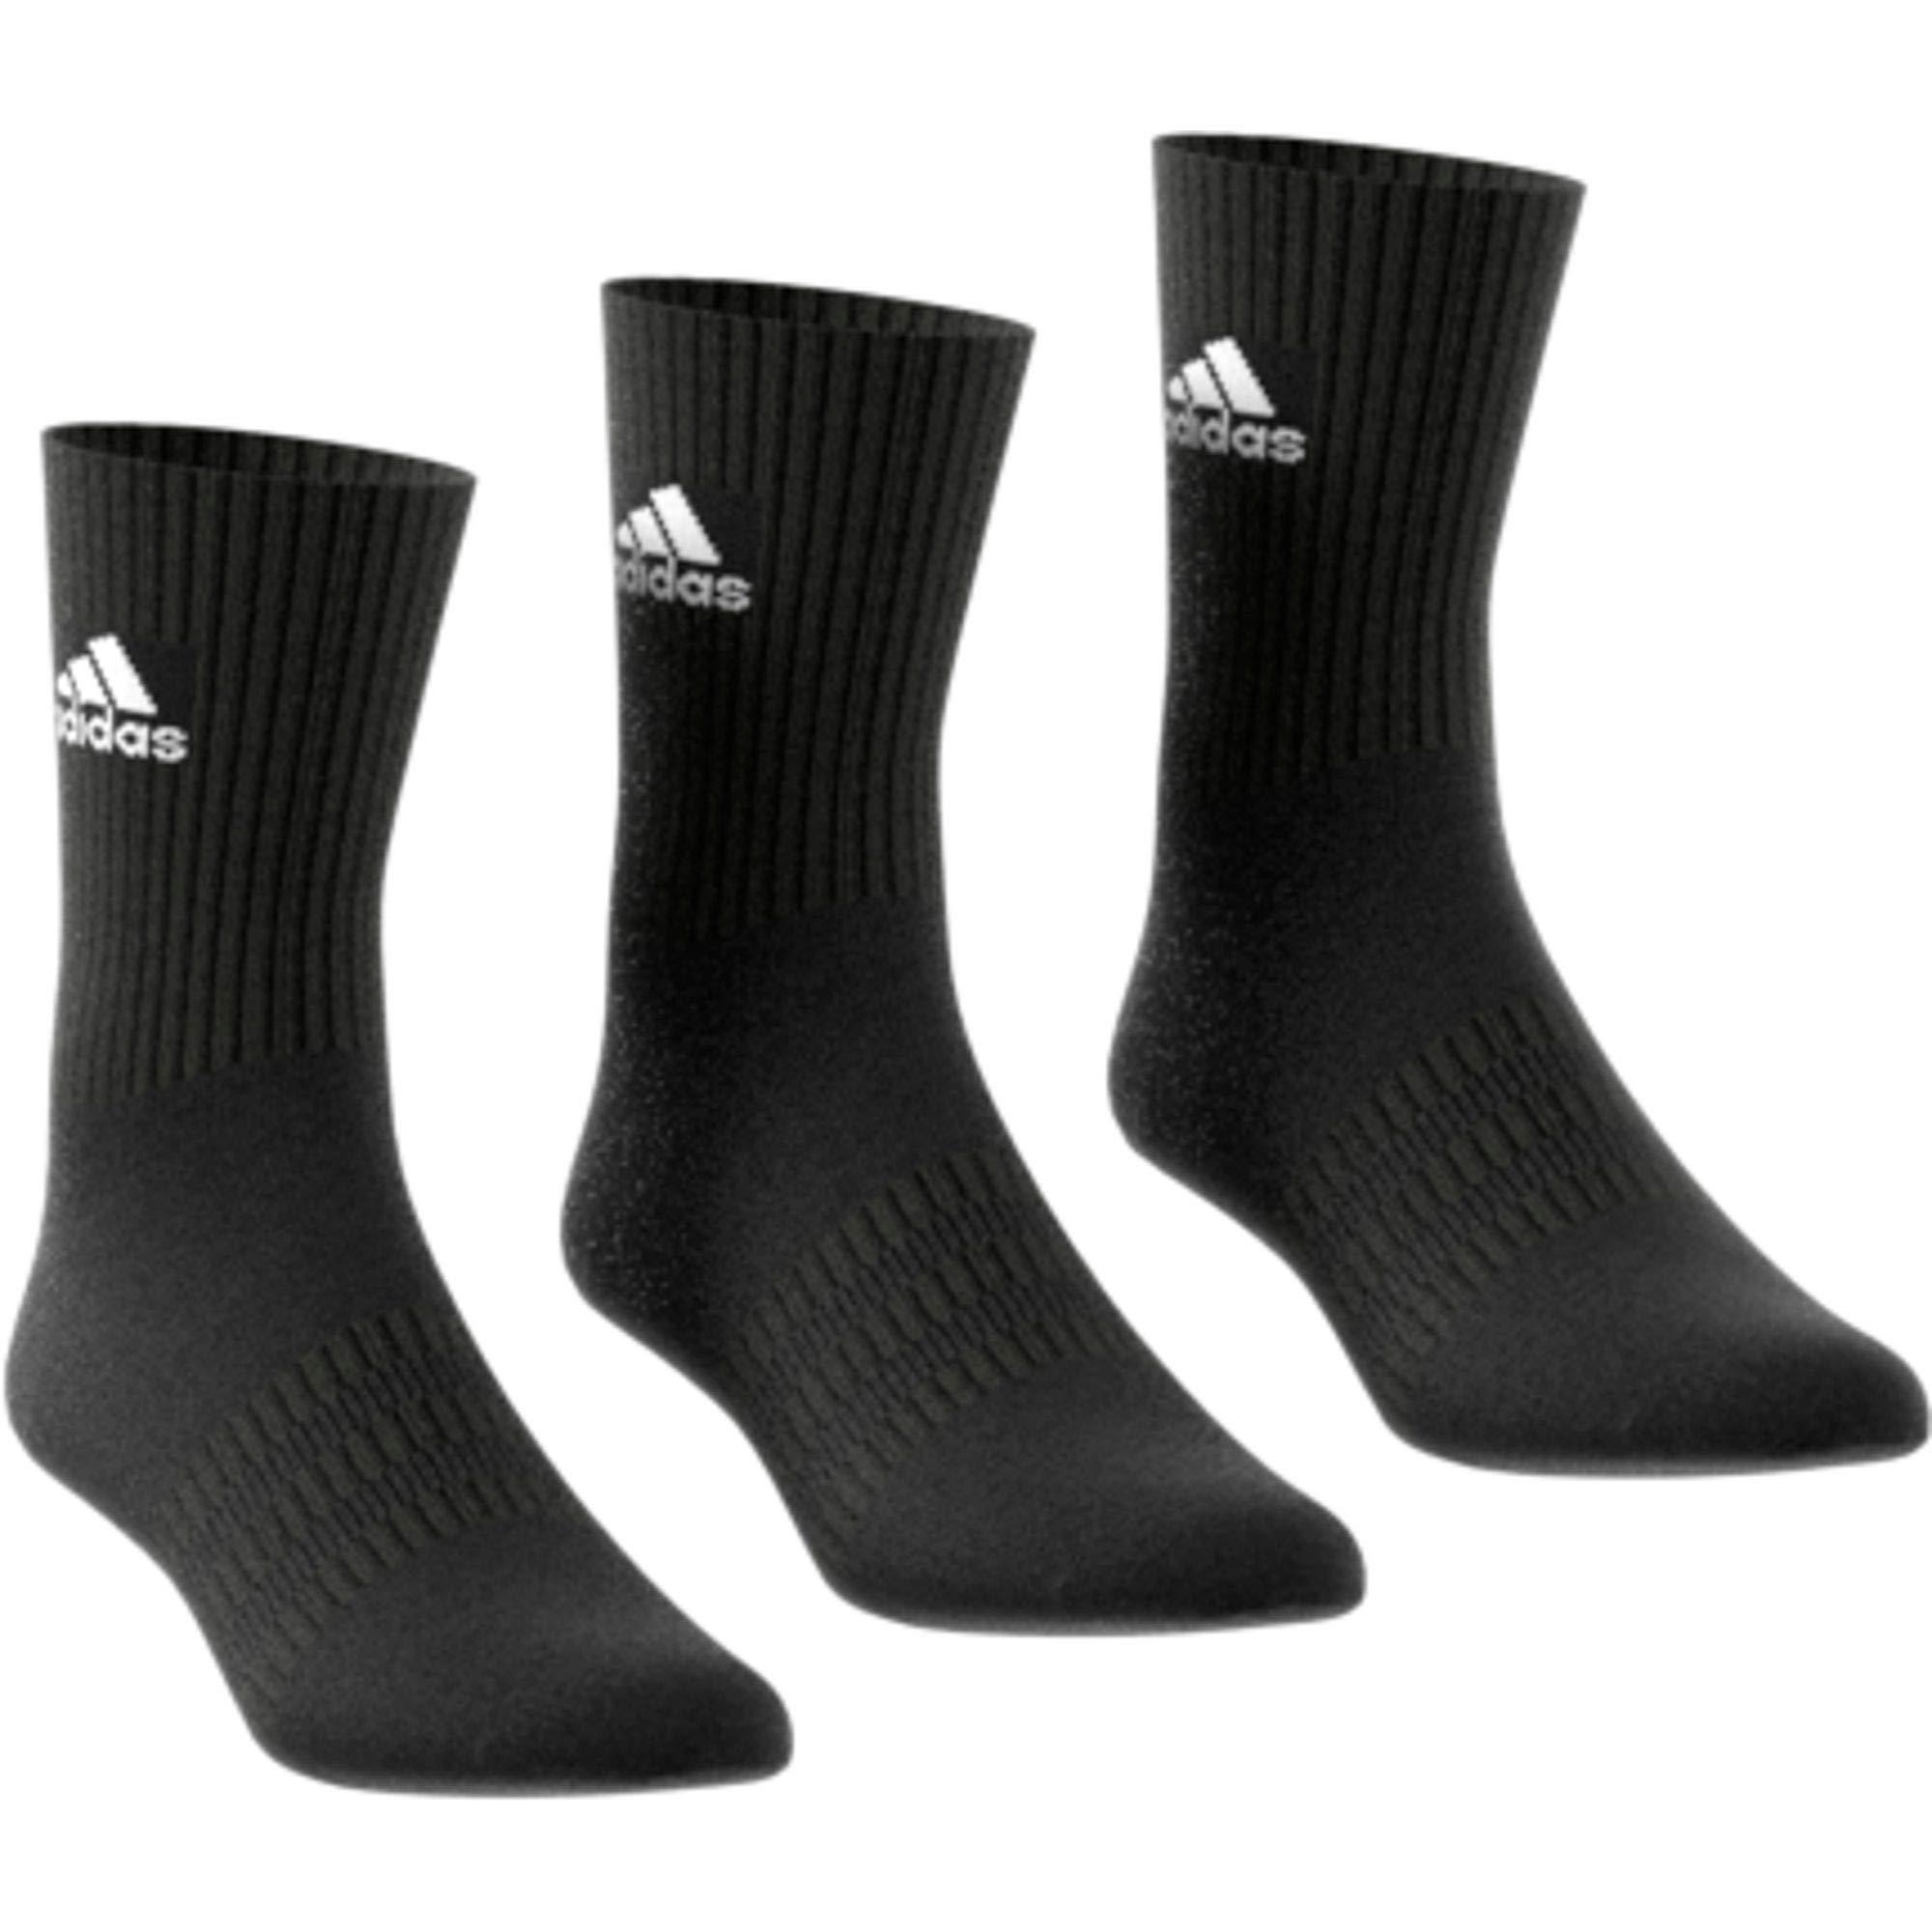 adidas CUSH CRW 3PP Socks, Black/Black/White, KXL